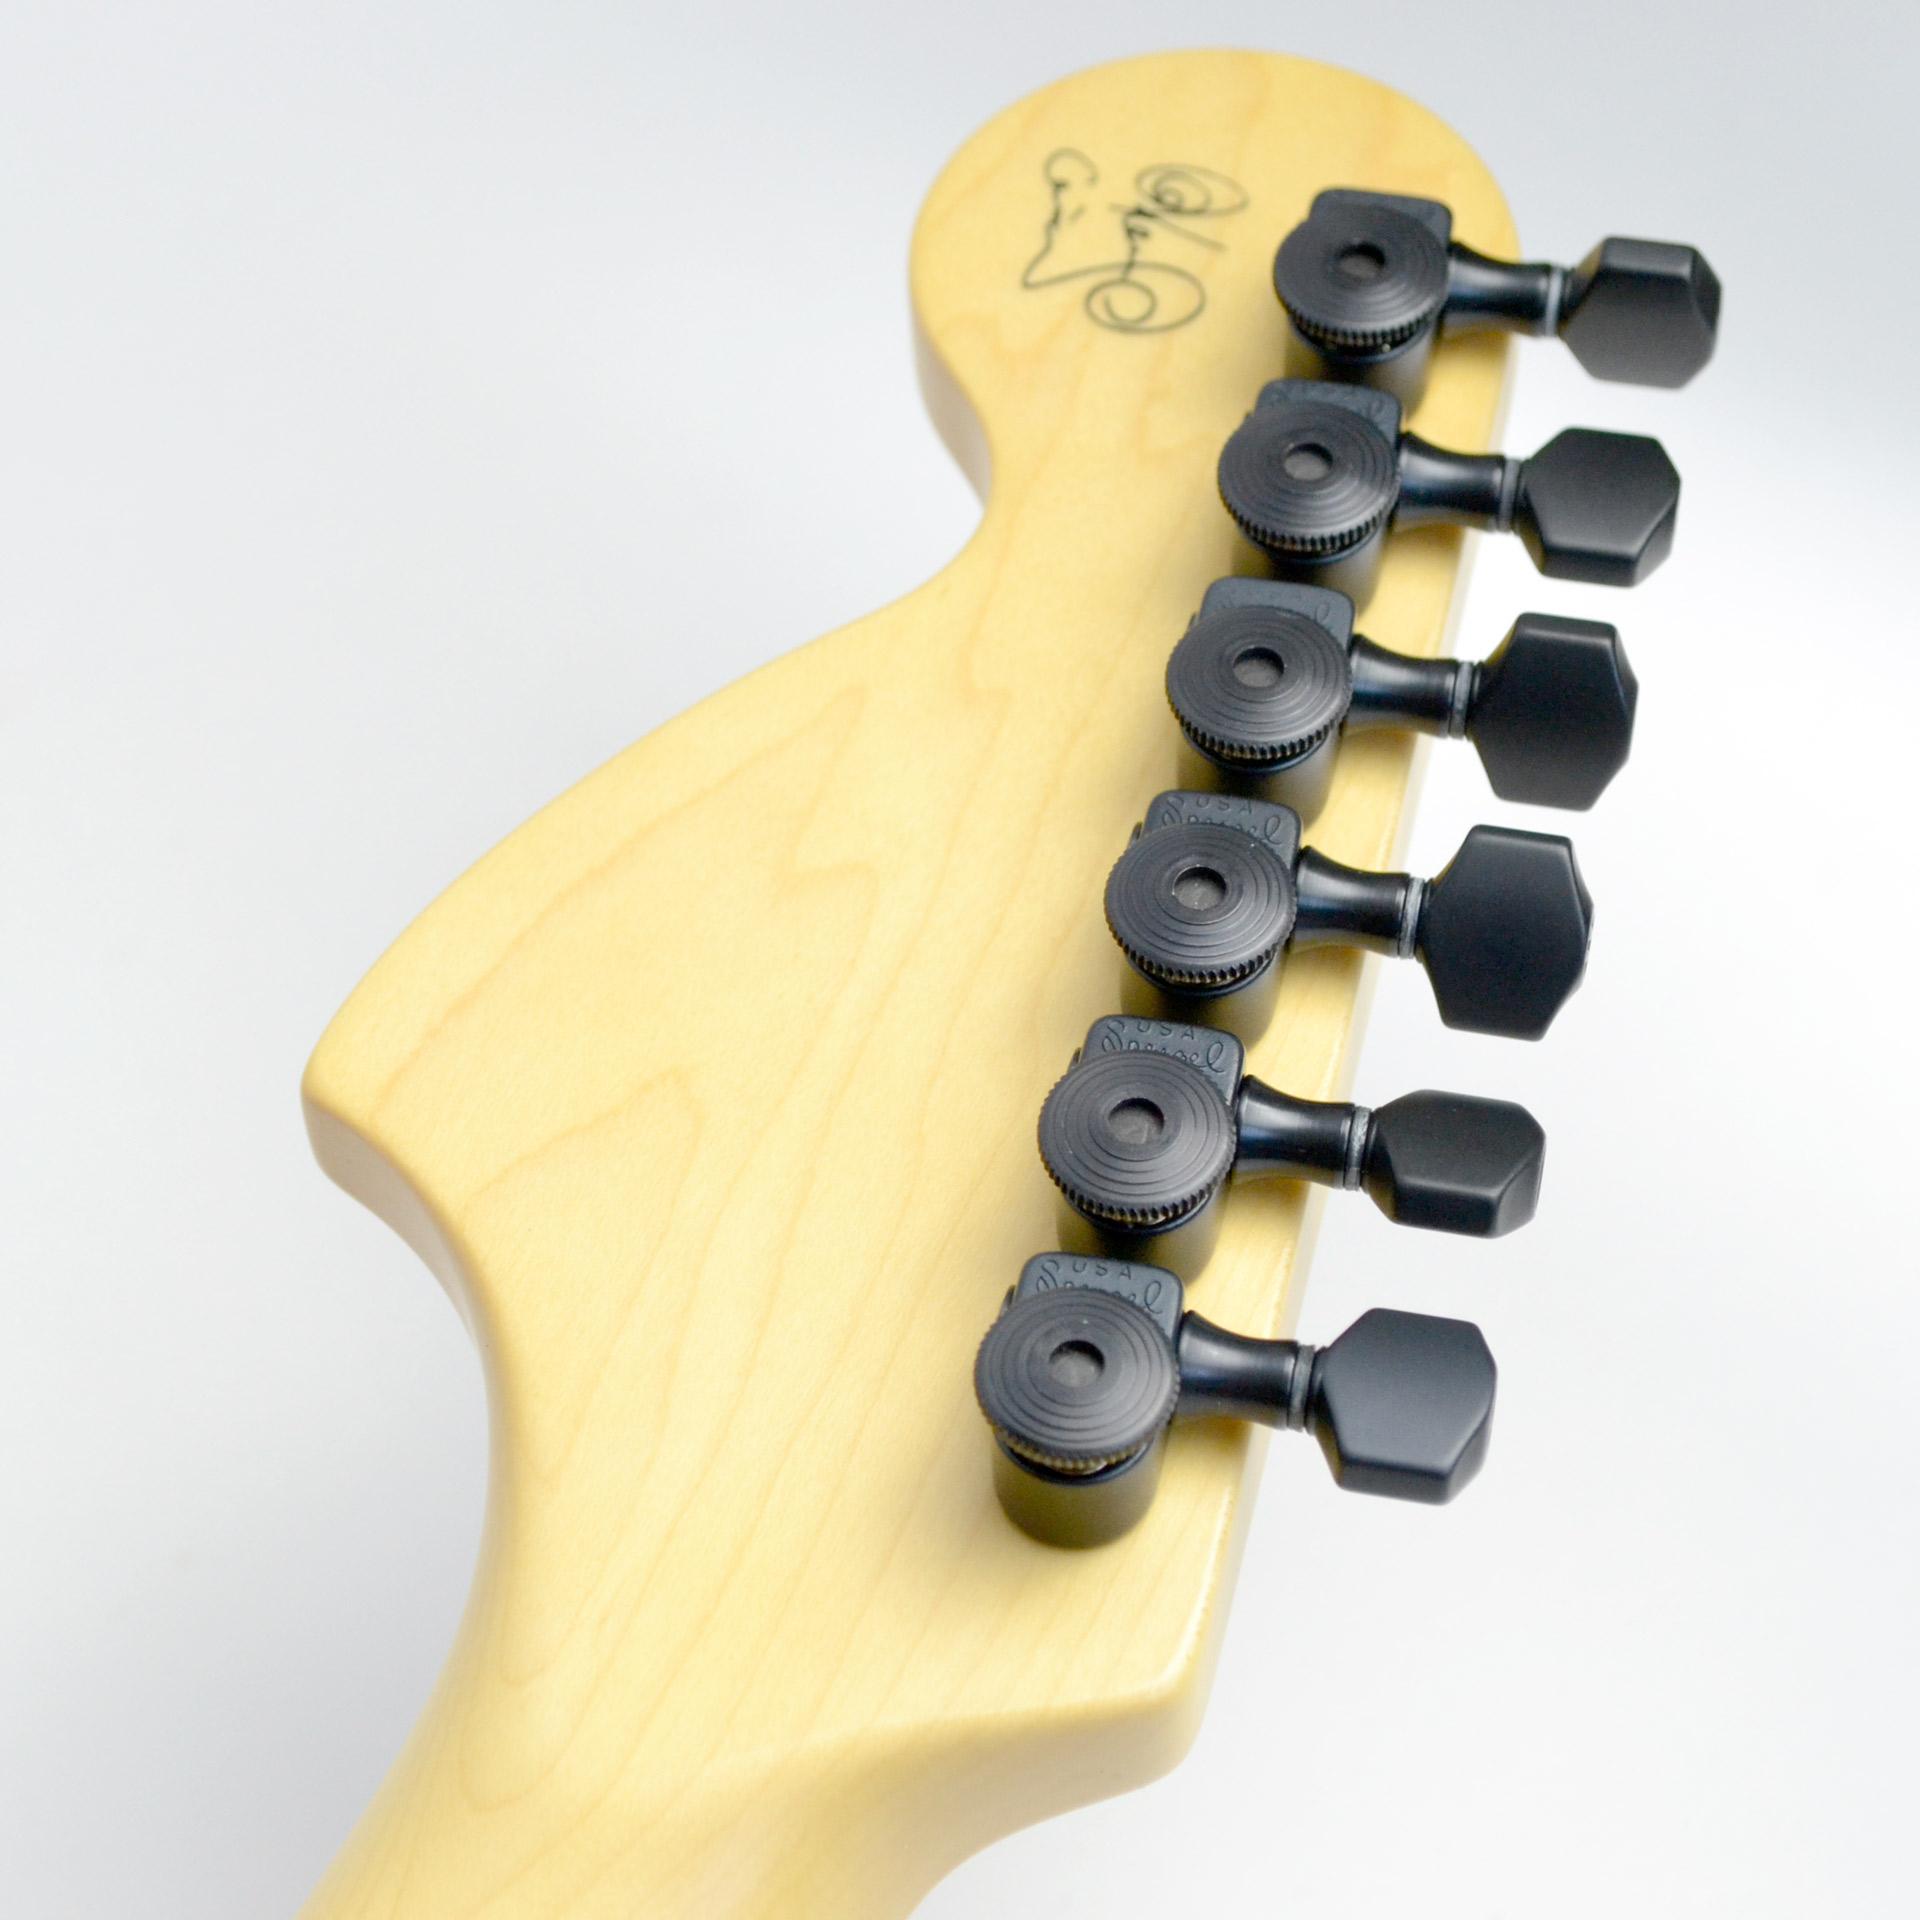 KEN Stratocasterのケース・その他画像